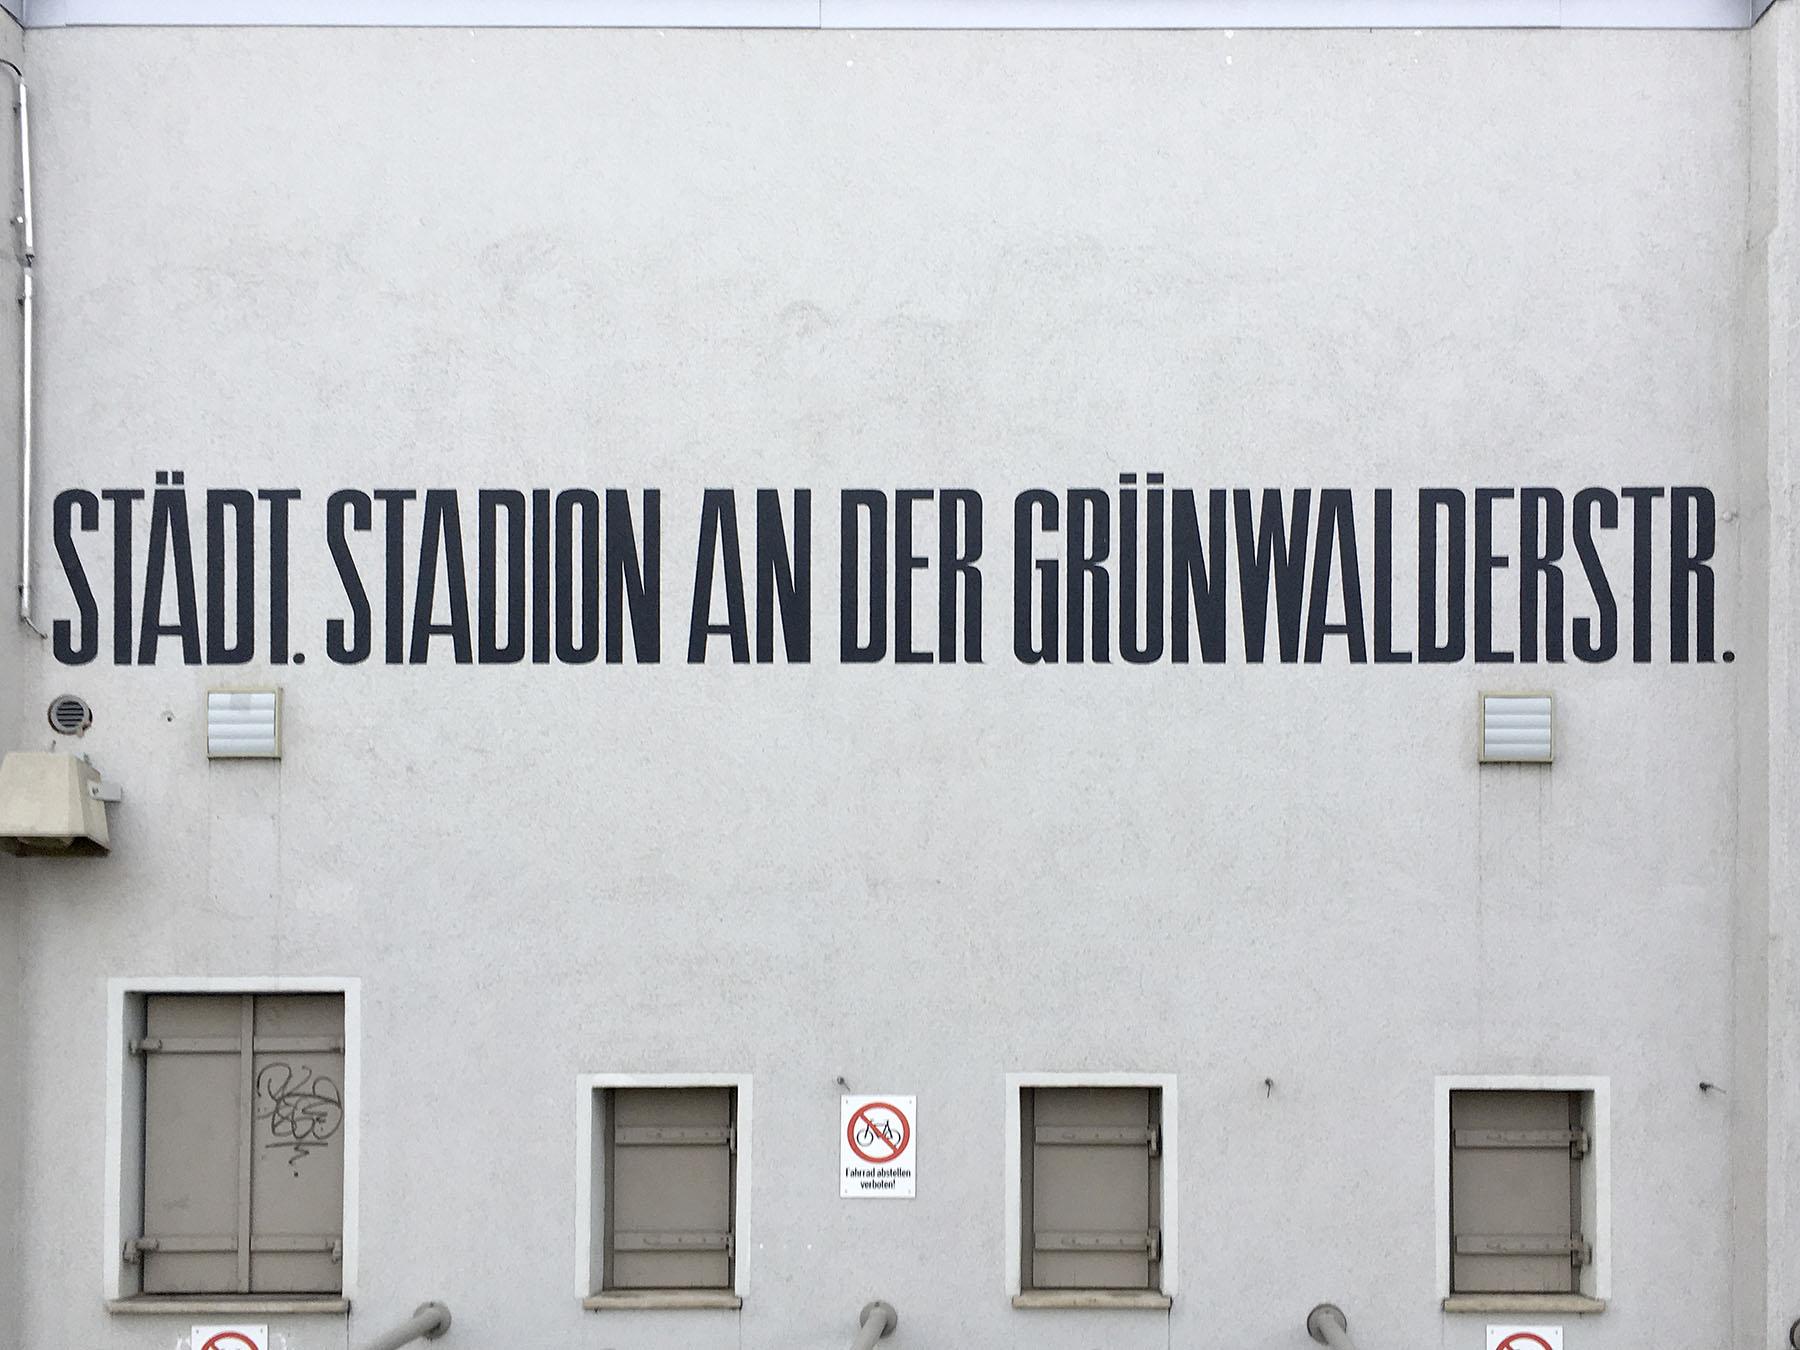 Germany 120 Nolan Paparelli @nolan_paparelli lo